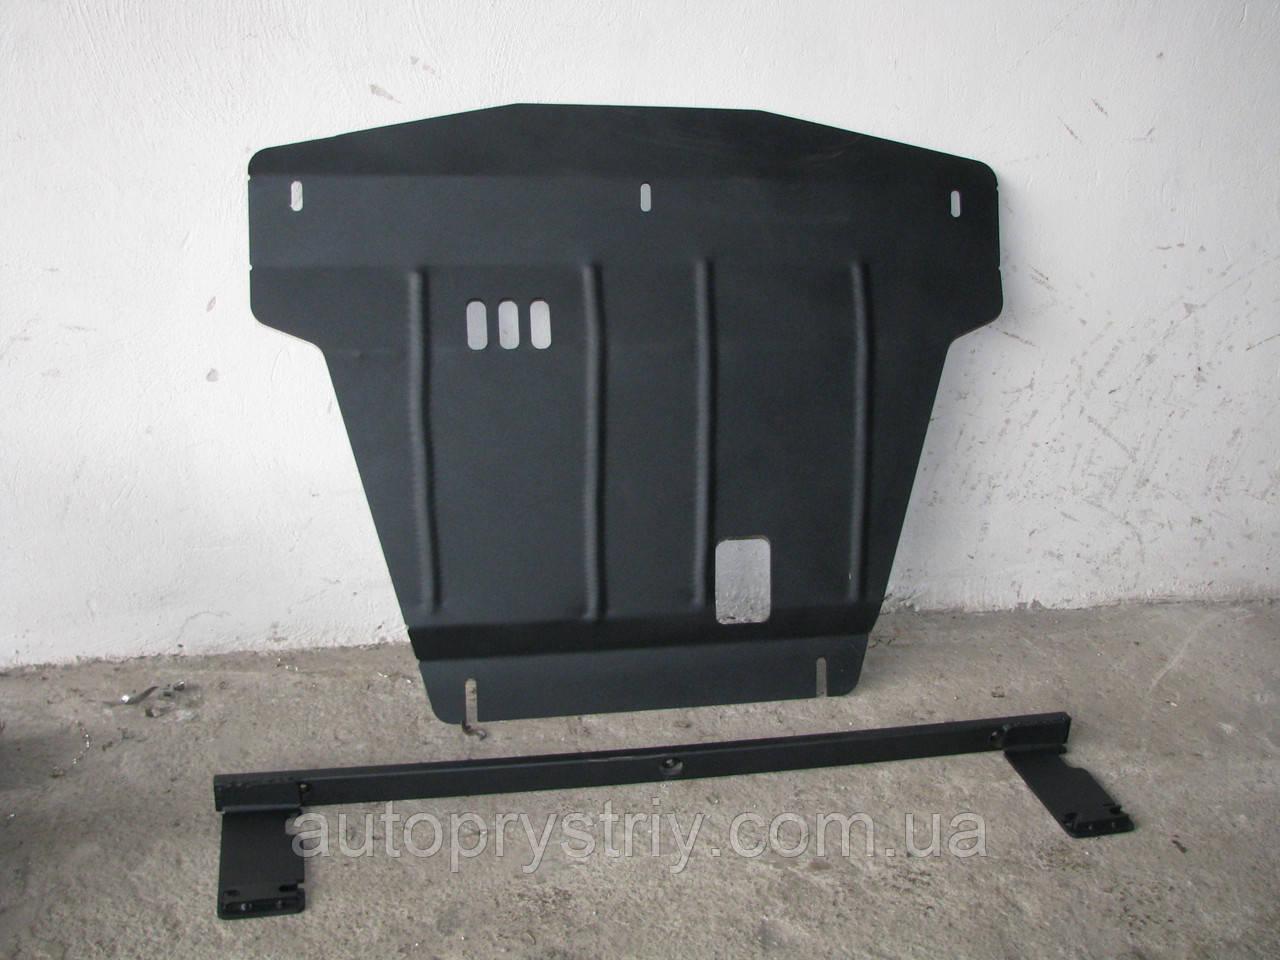 Захист двигуна, КПП і радіатора Ford Fiesta 5-дверна (2002-2005) 1.3